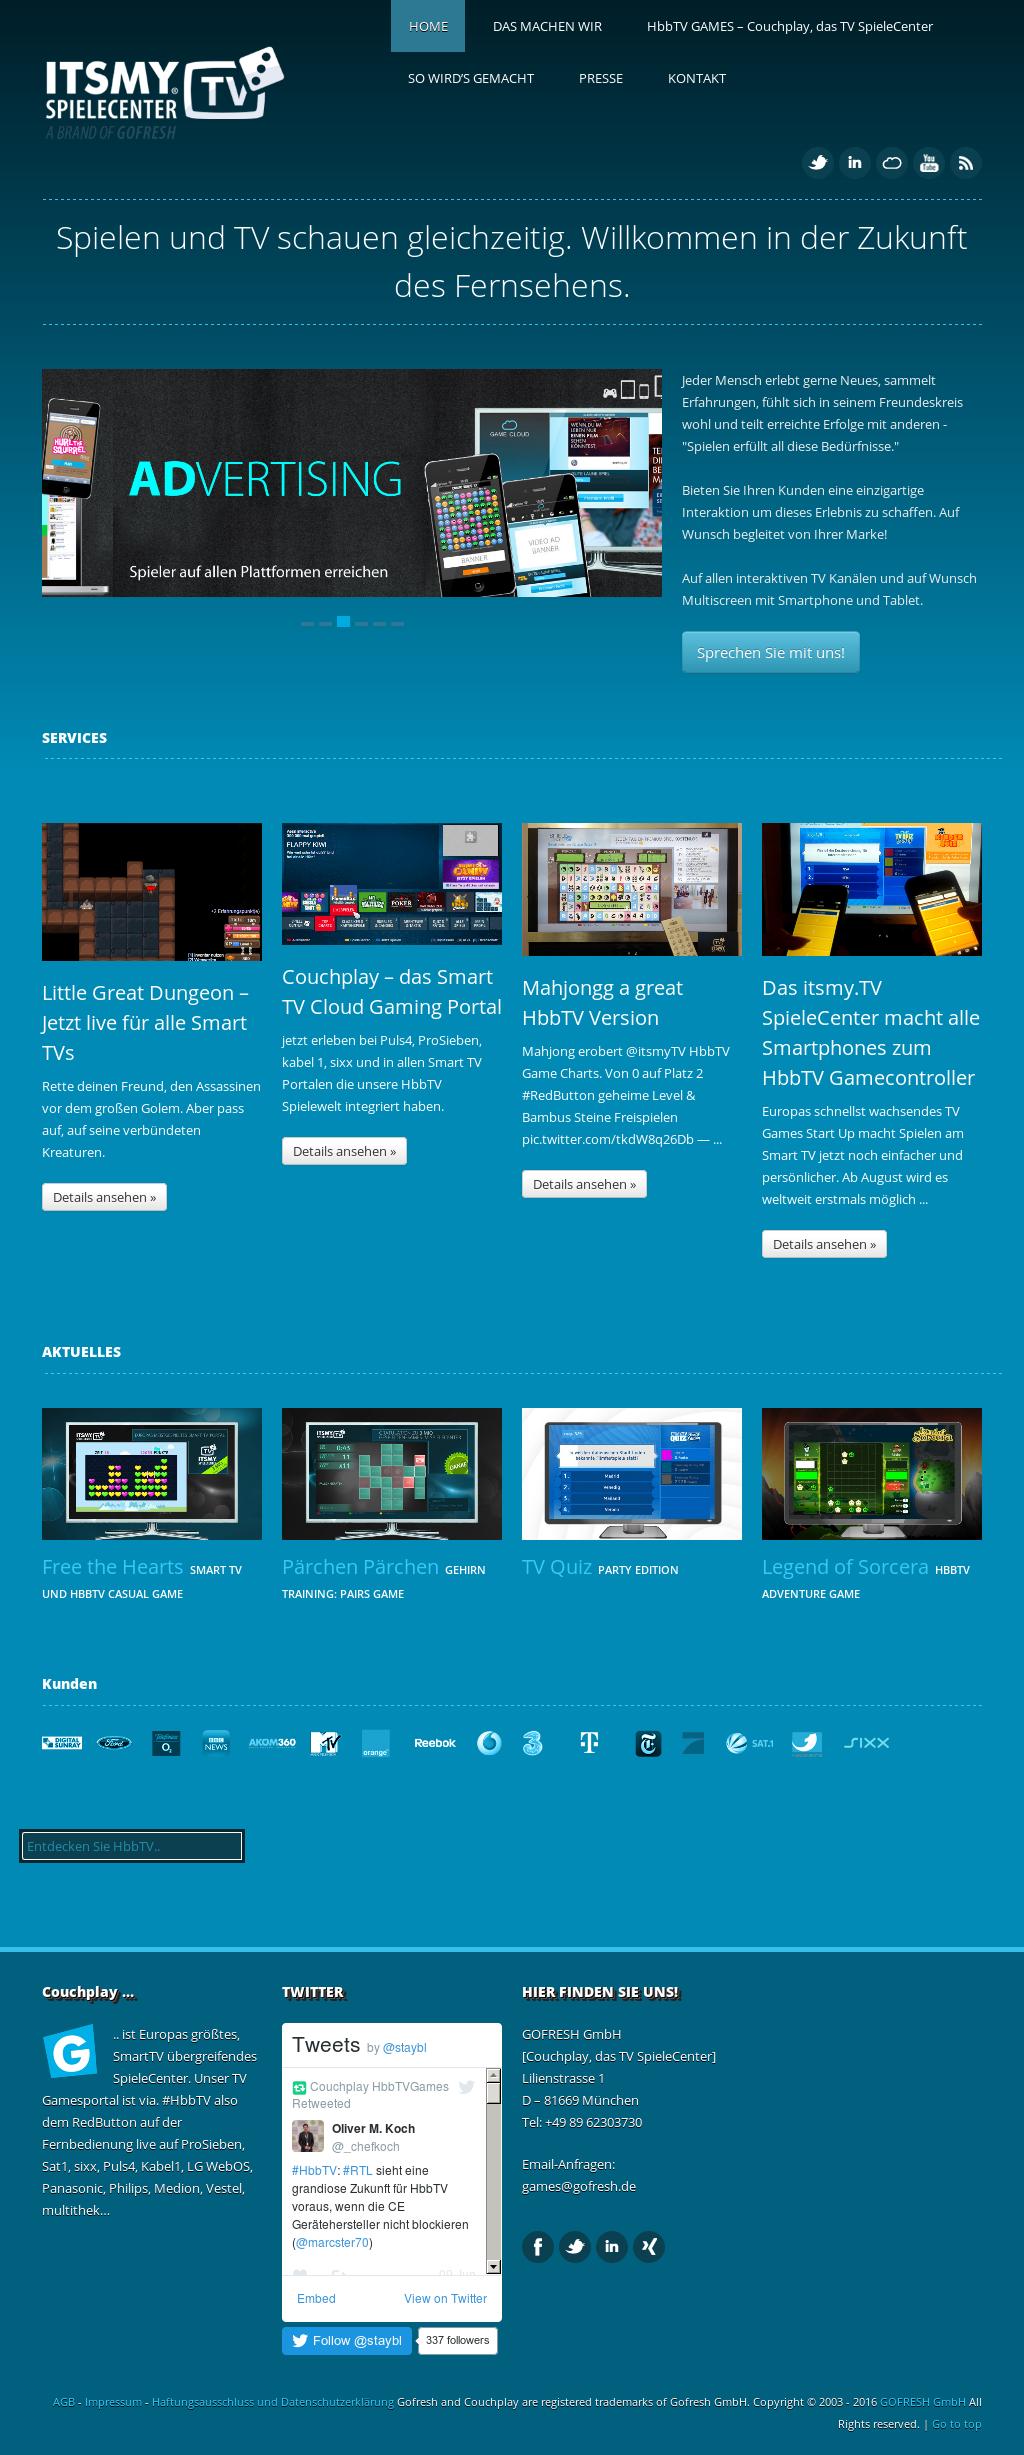 Owler Reports - Itsmy tv Spielecenter Blog HbbTV Video of